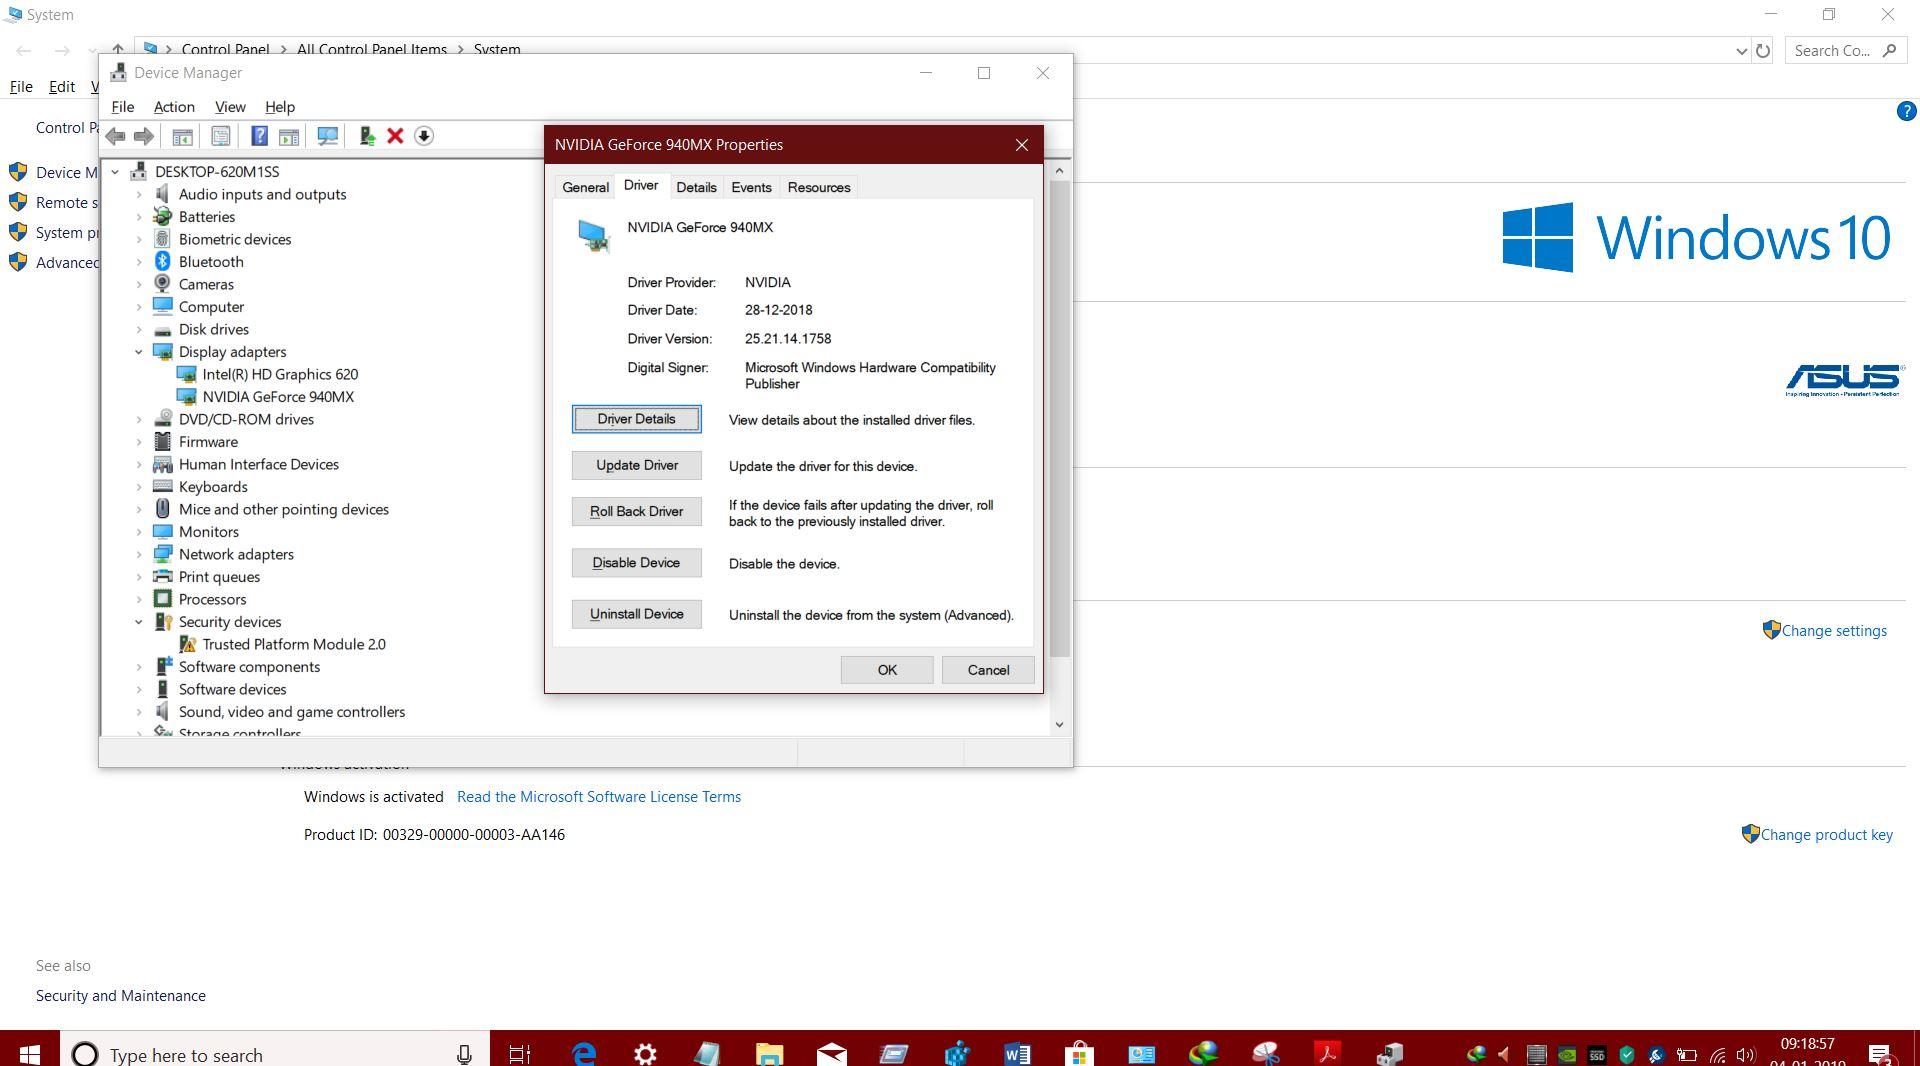 Nvidia Inc Released new Geforce DCH & STANDARD Whql hotfix Driver v445.78 for notebooks... 2d13a617-dbf9-494c-975a-f1c719e23476?upload=true.jpg